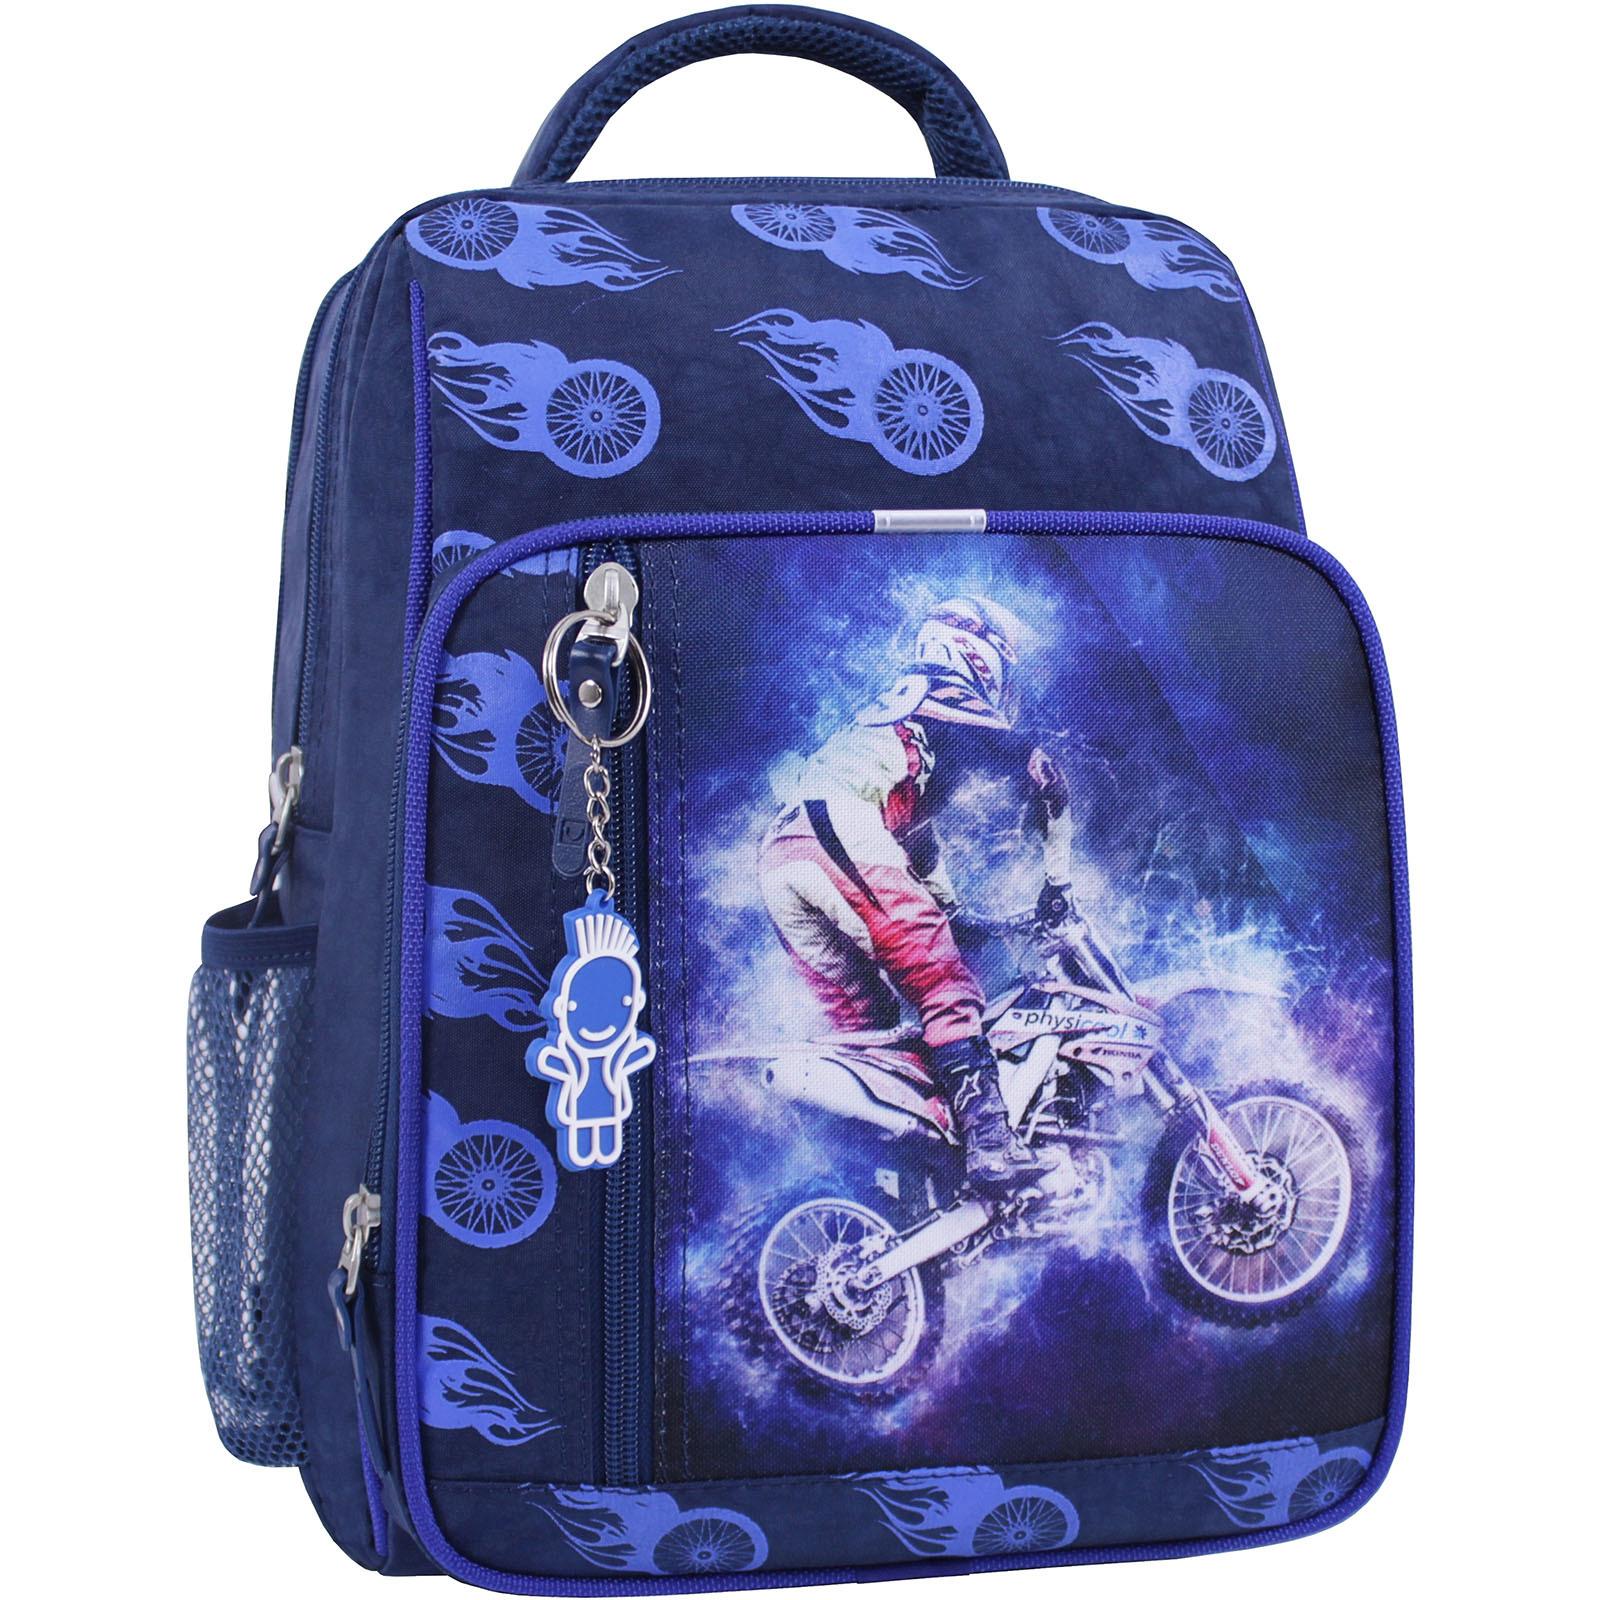 Школьные рюкзаки Рюкзак школьный Bagland Школьник 8 л. синий 507 (0012870) IMG_1028_суб.507_.JPG